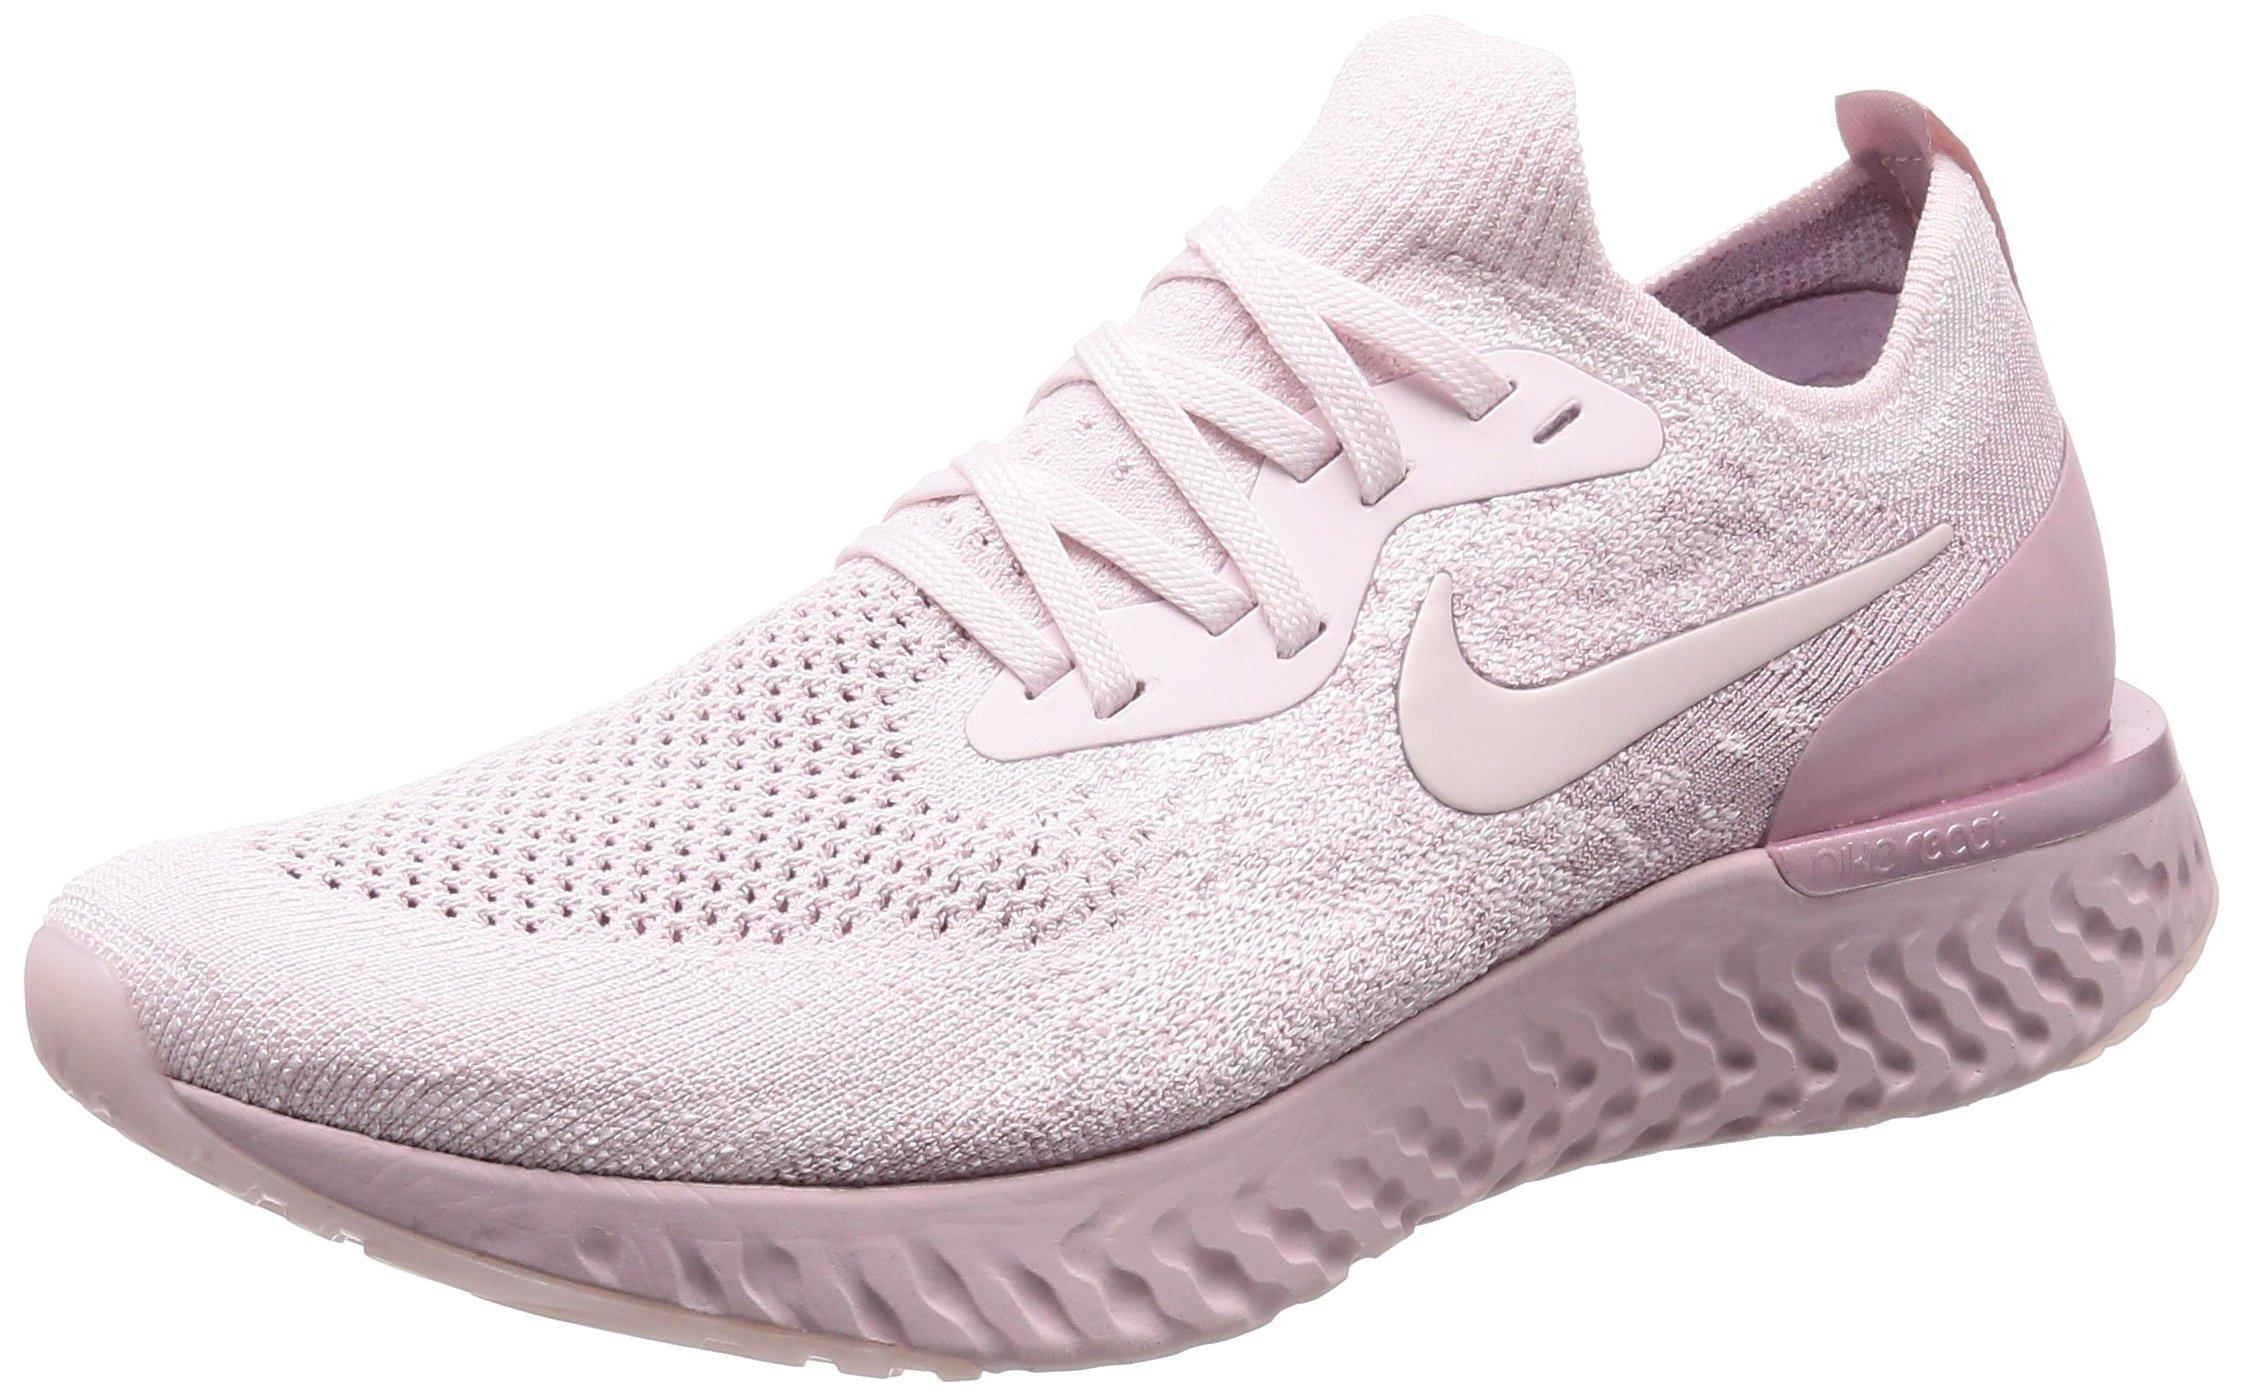 f589070c3e8ea Nike Mens Epic React Flyknit Running Trainers AQ0067 Sneakers Shoes (UK 7.5  US 8.5 EU 42, Pearl Pink 600)